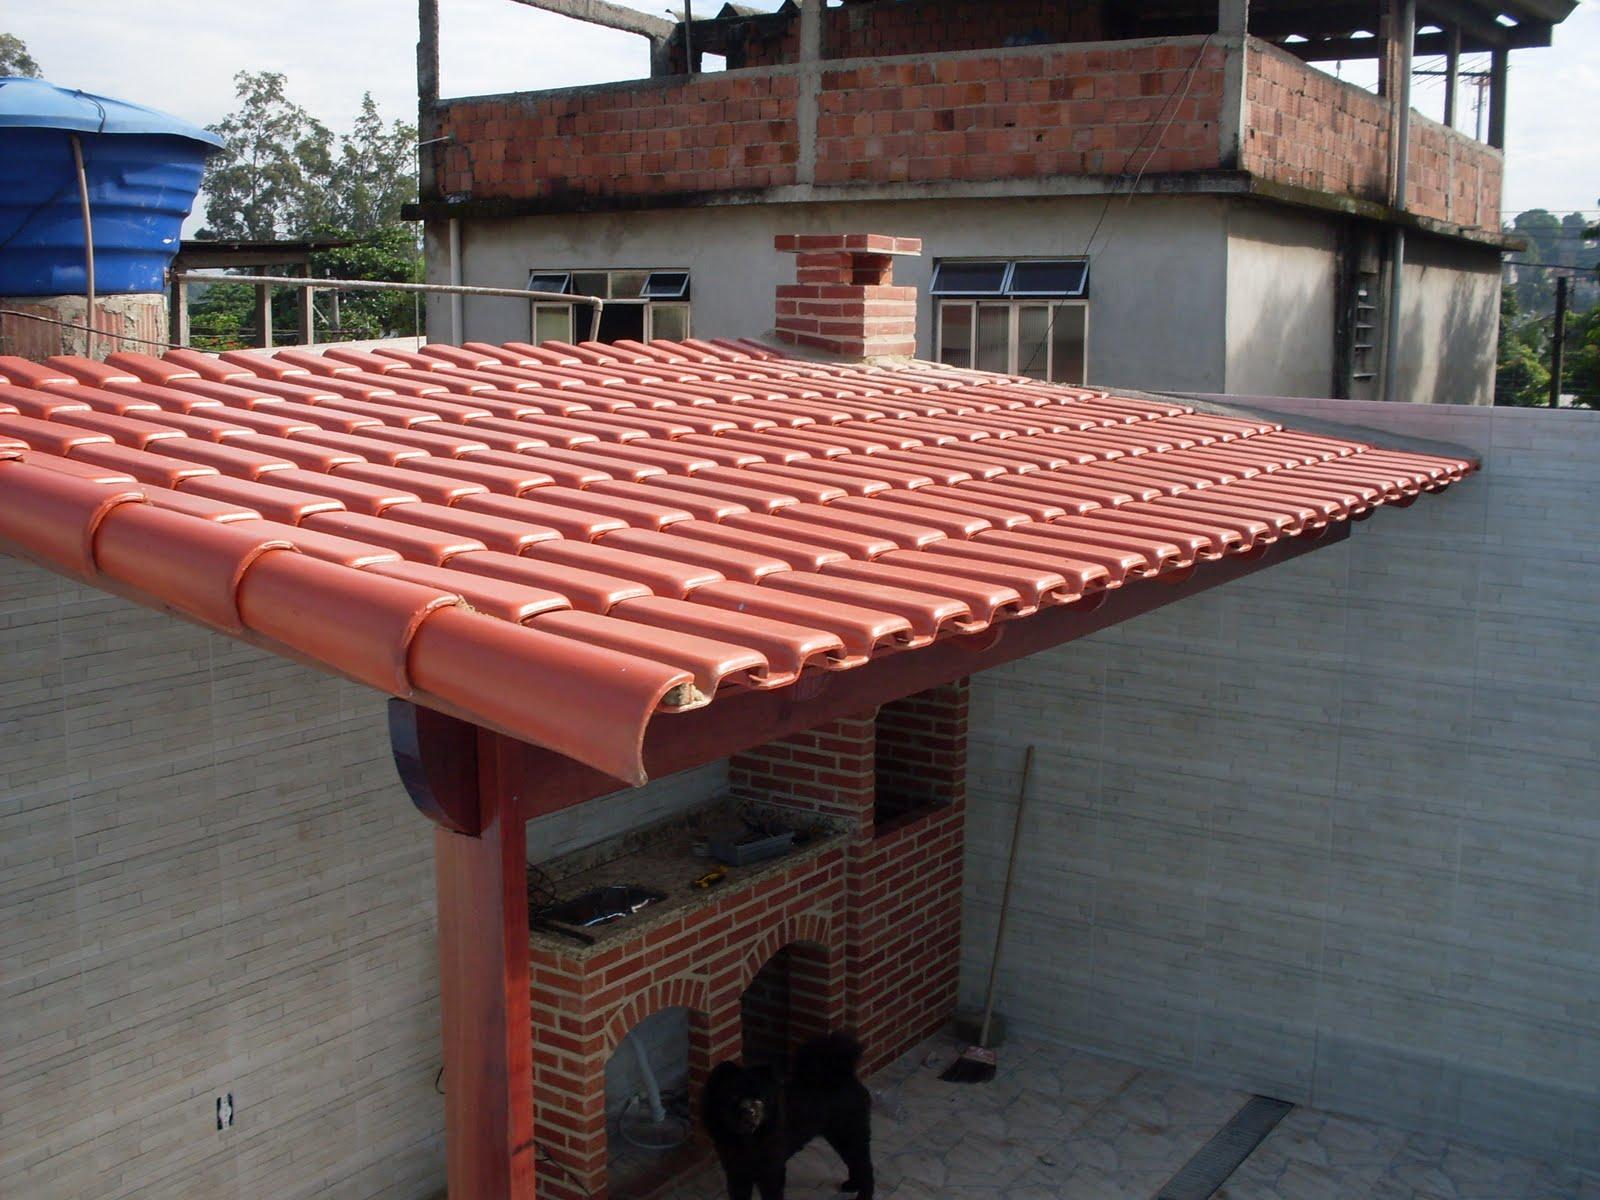 ZANI Churrasqueiras telhados e projetos: Telhado colonial montado #A24429 1600x1200